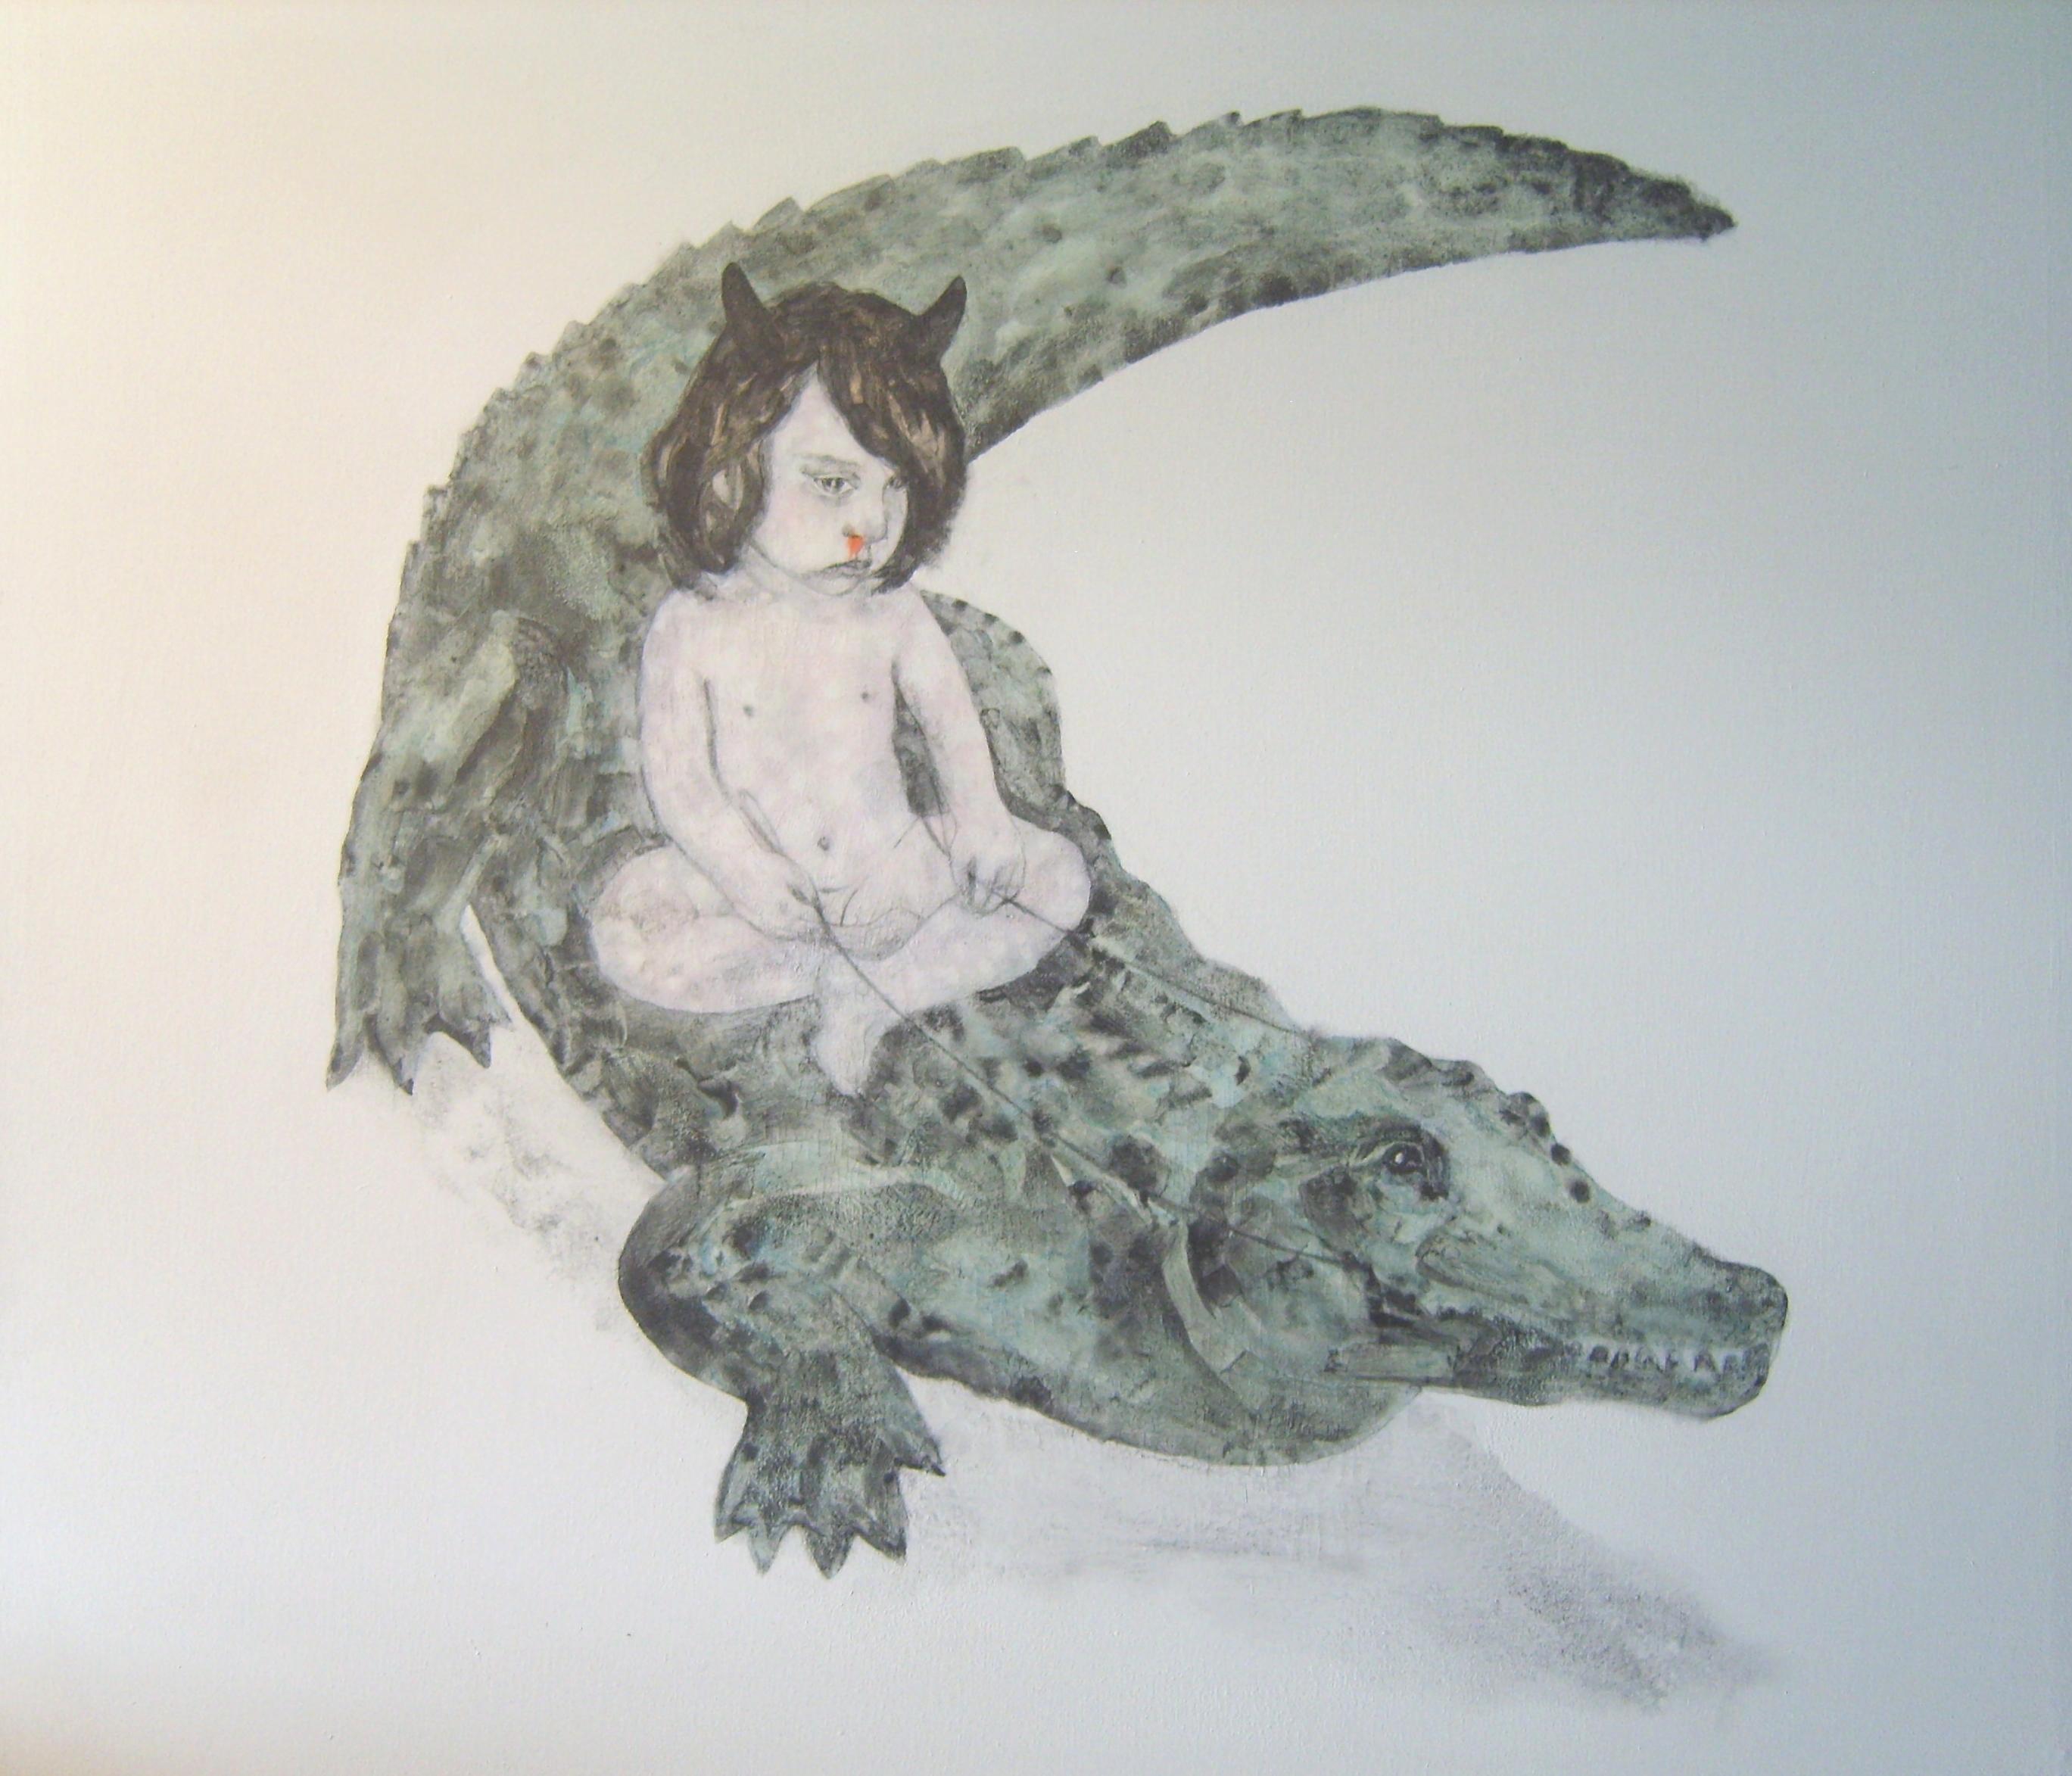 Insomnia 12. Tinta y grafito sobre lienzo (100x100cm)